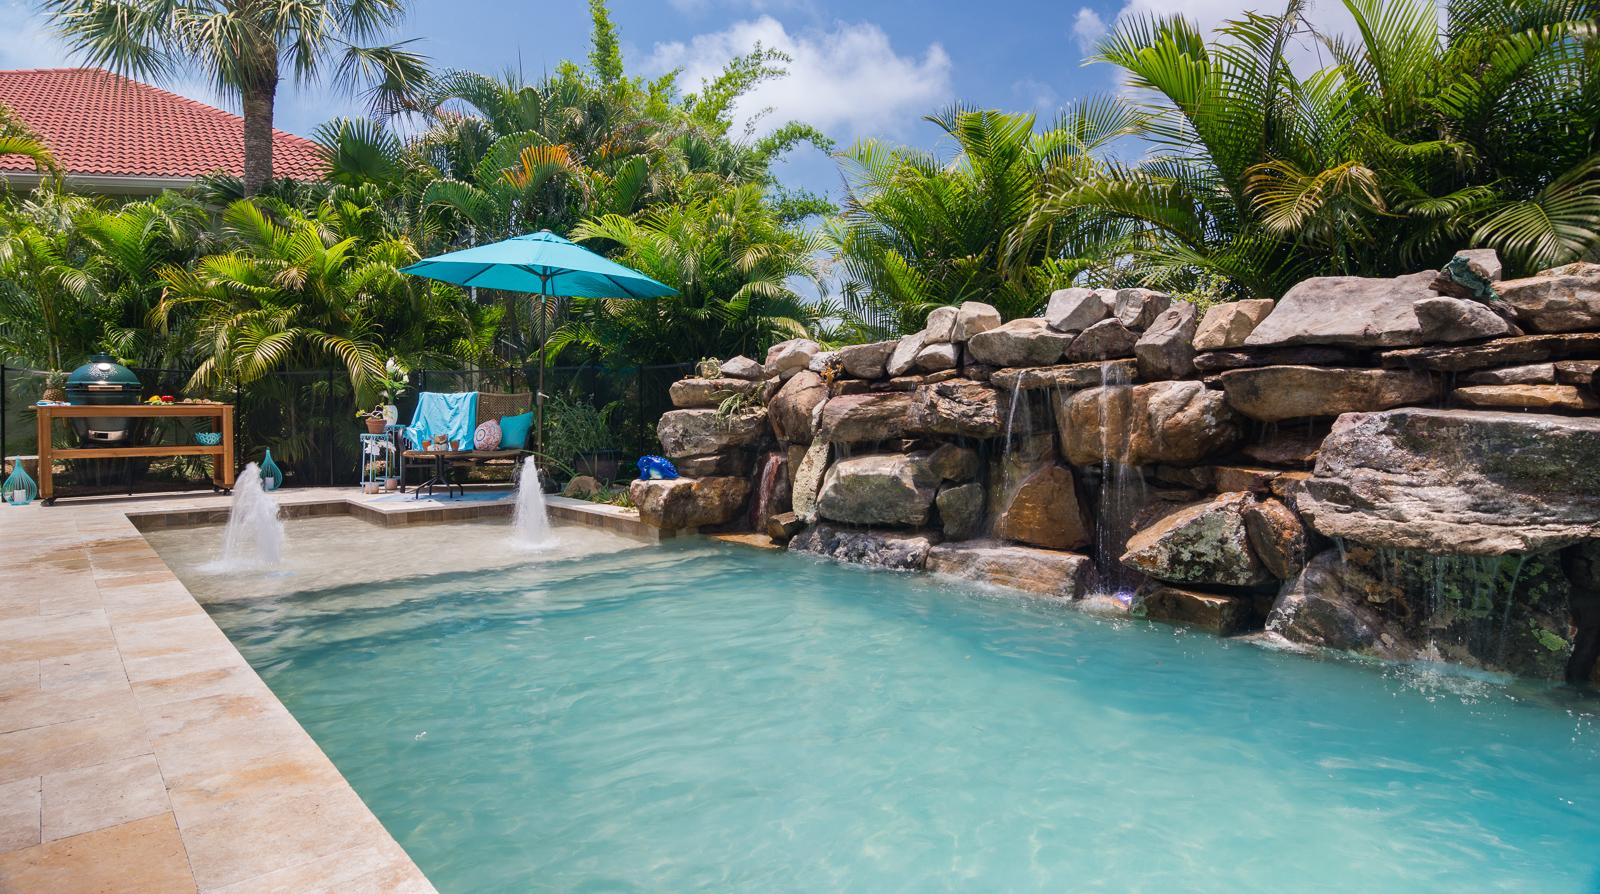 Insane pools tv episode small yard big dreams for Custom inground swimming pools